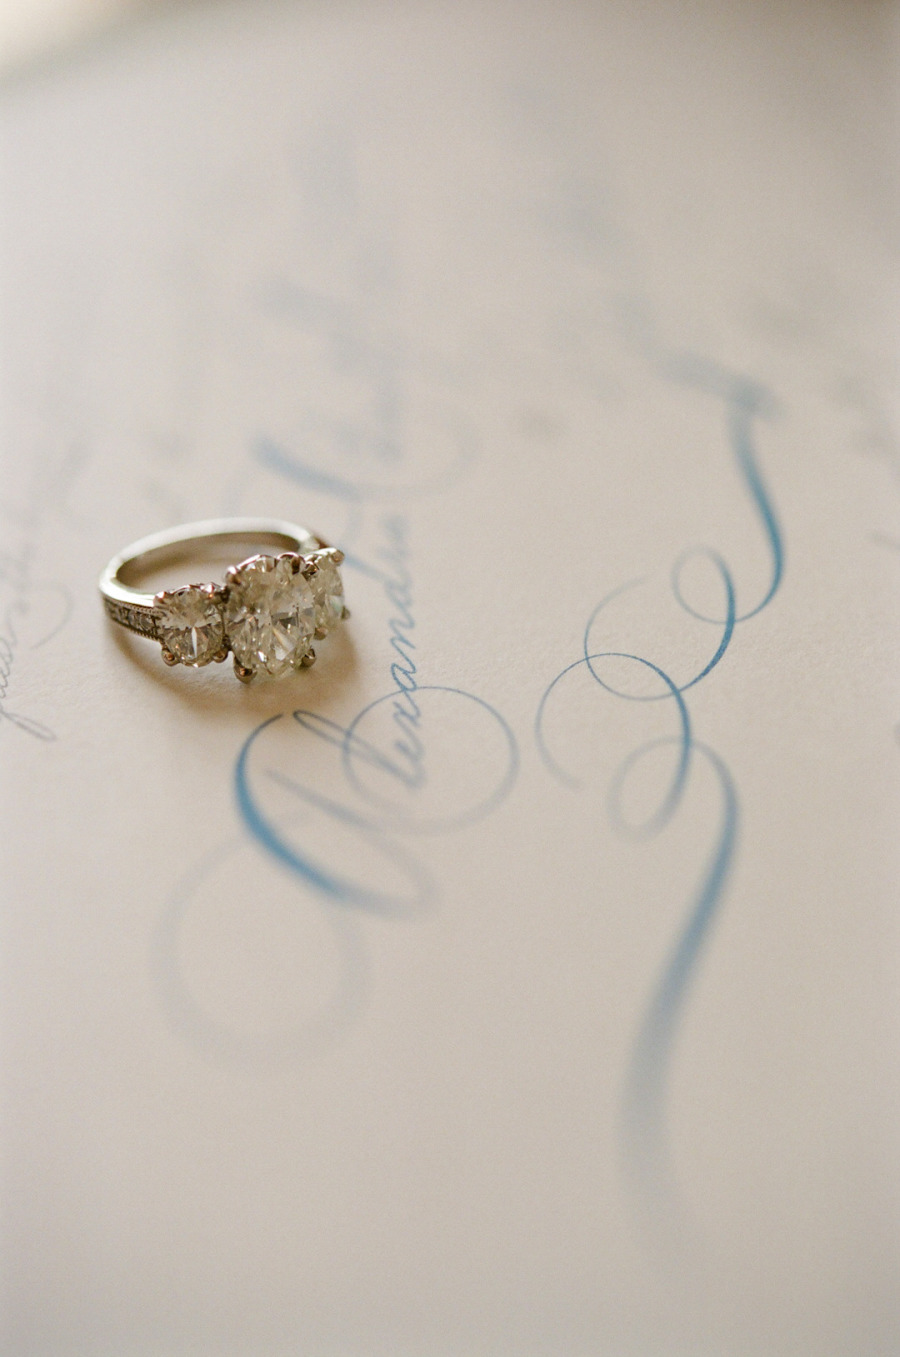 26. Ring on Invitation Close-Up